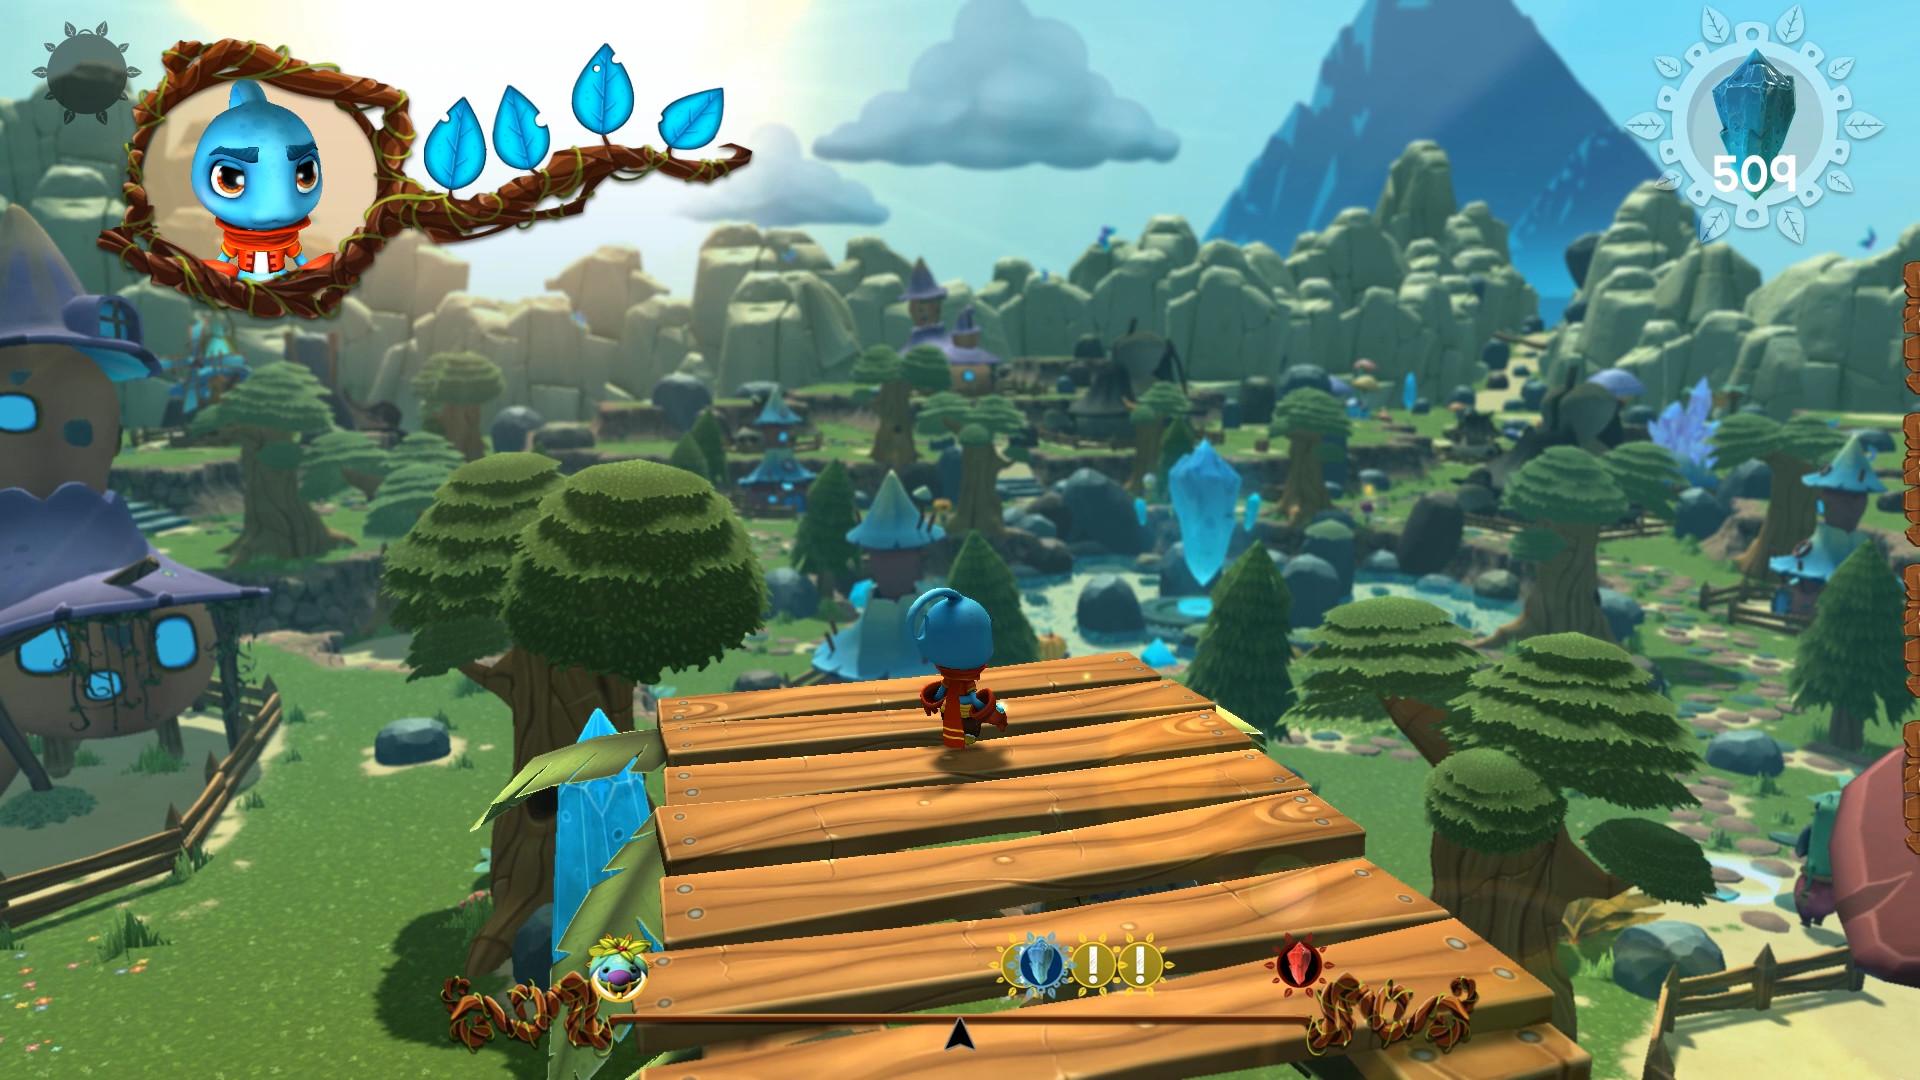 Ginger: Beyond the Crystal screenshot